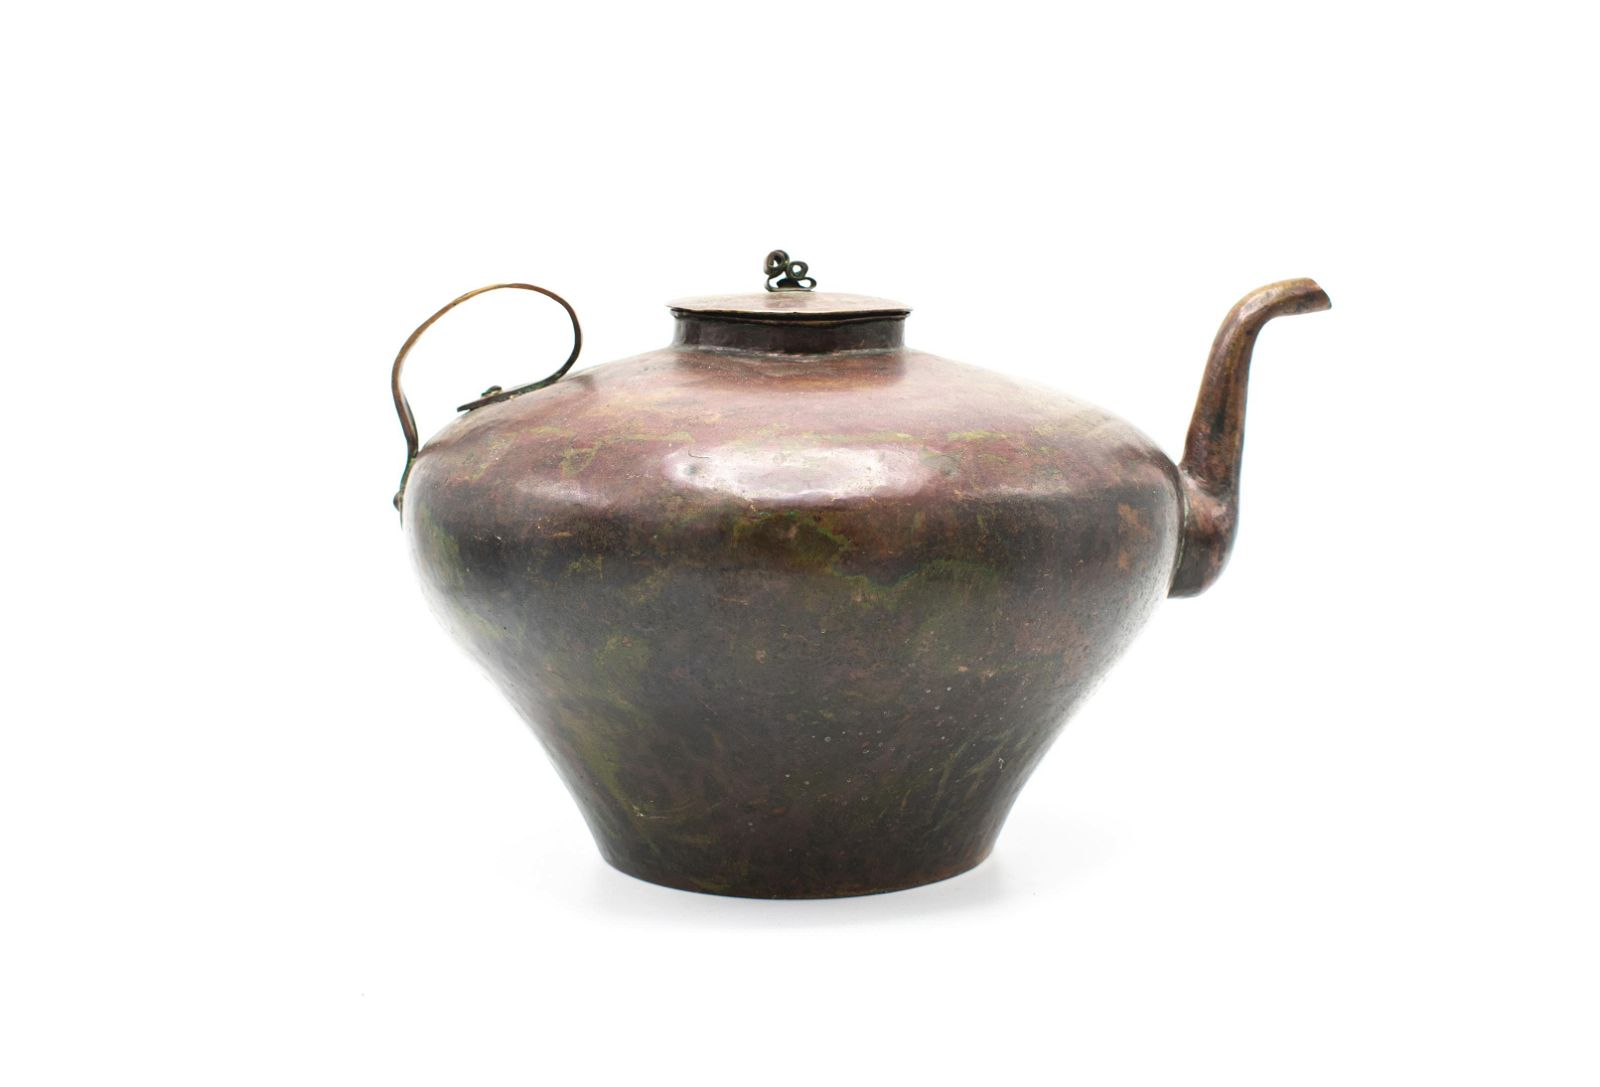 Russian European Copper Teapot